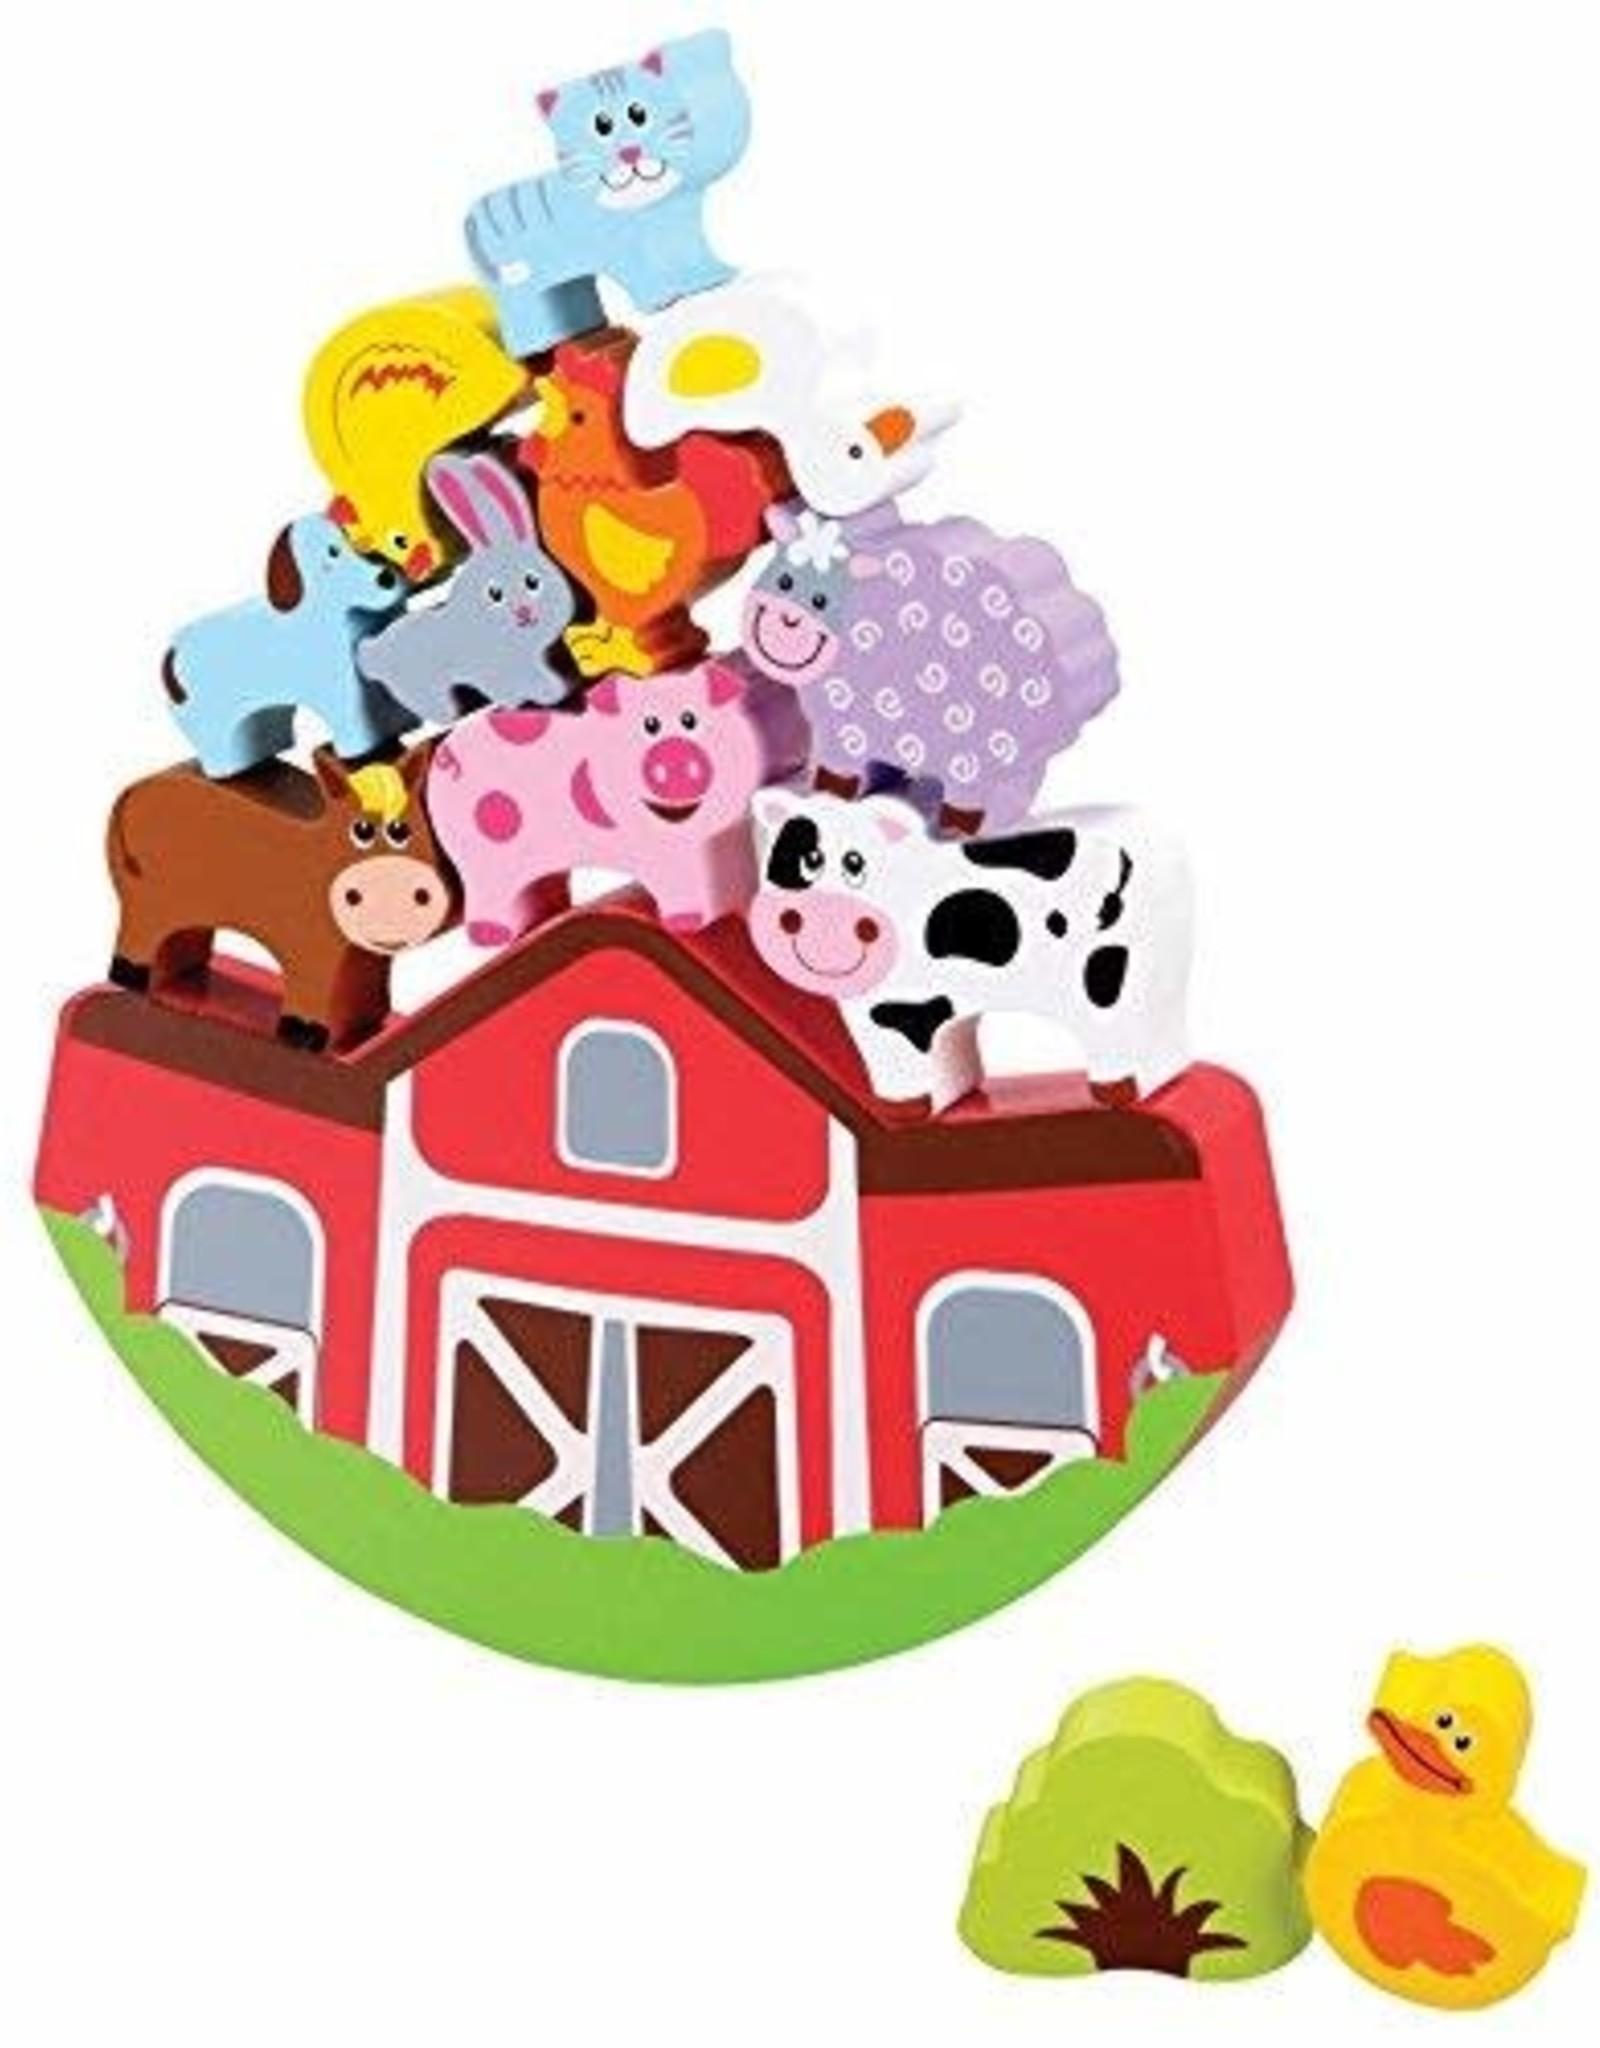 WowToyz Balancing Farm Playset